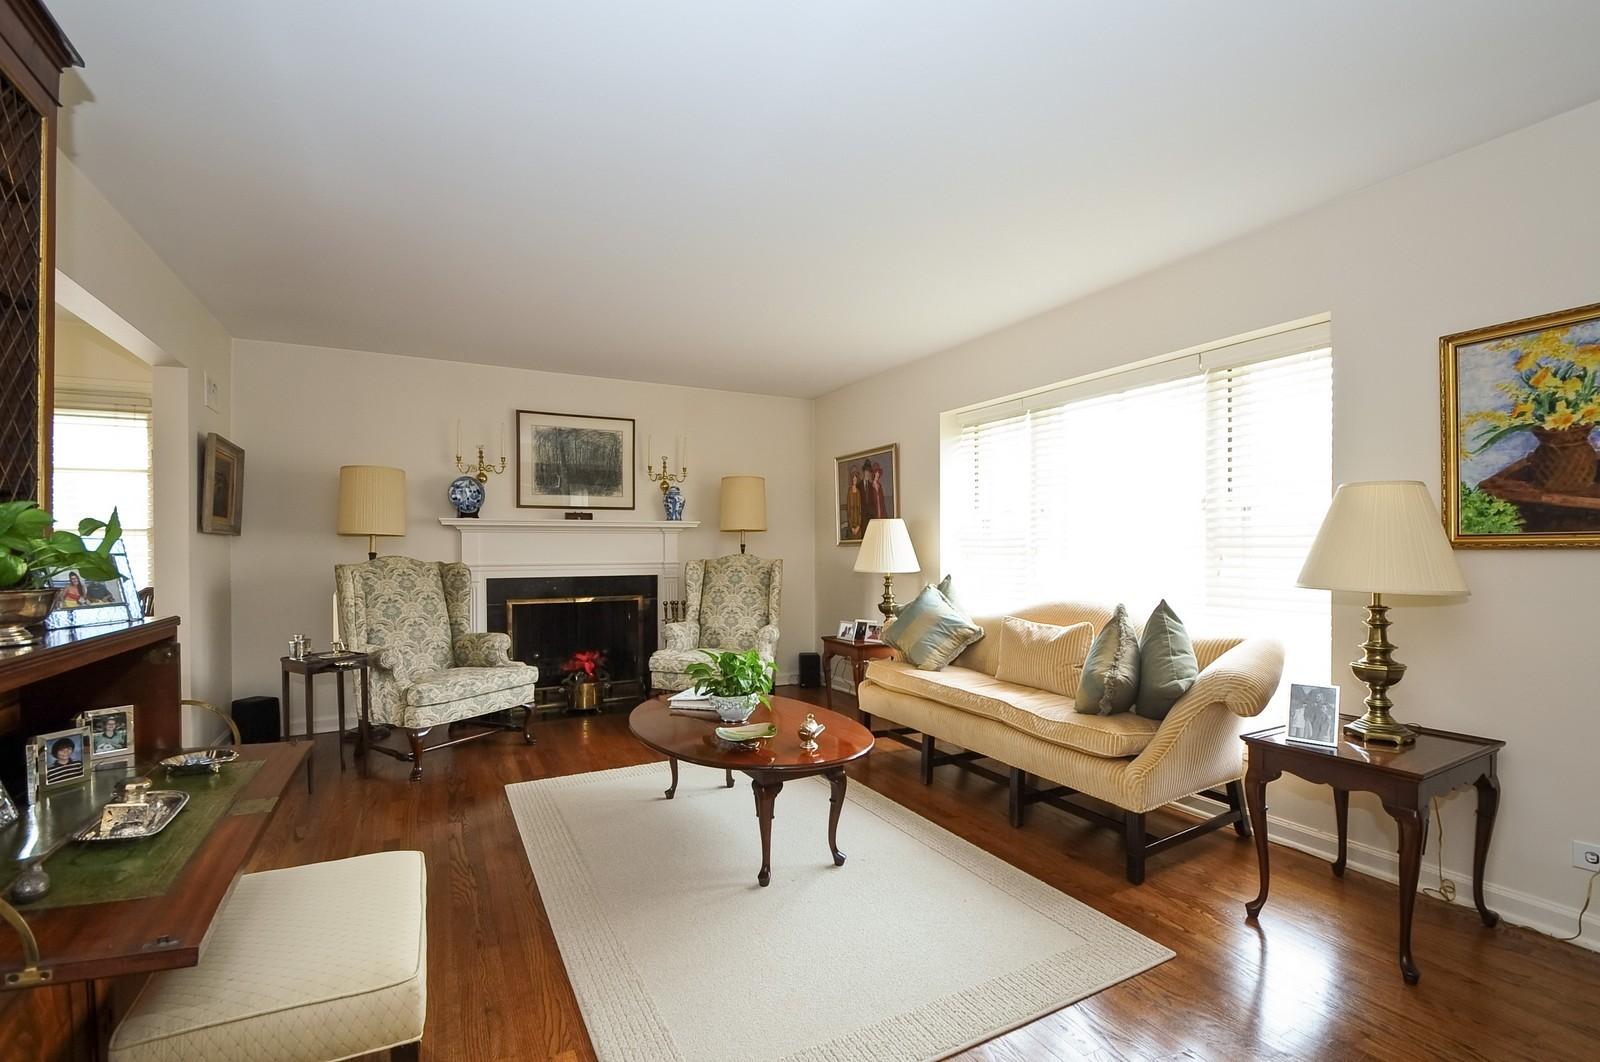 Real Estate Photography - 930 Bob O Link, Highland Park, IL, 60035 - Living Room